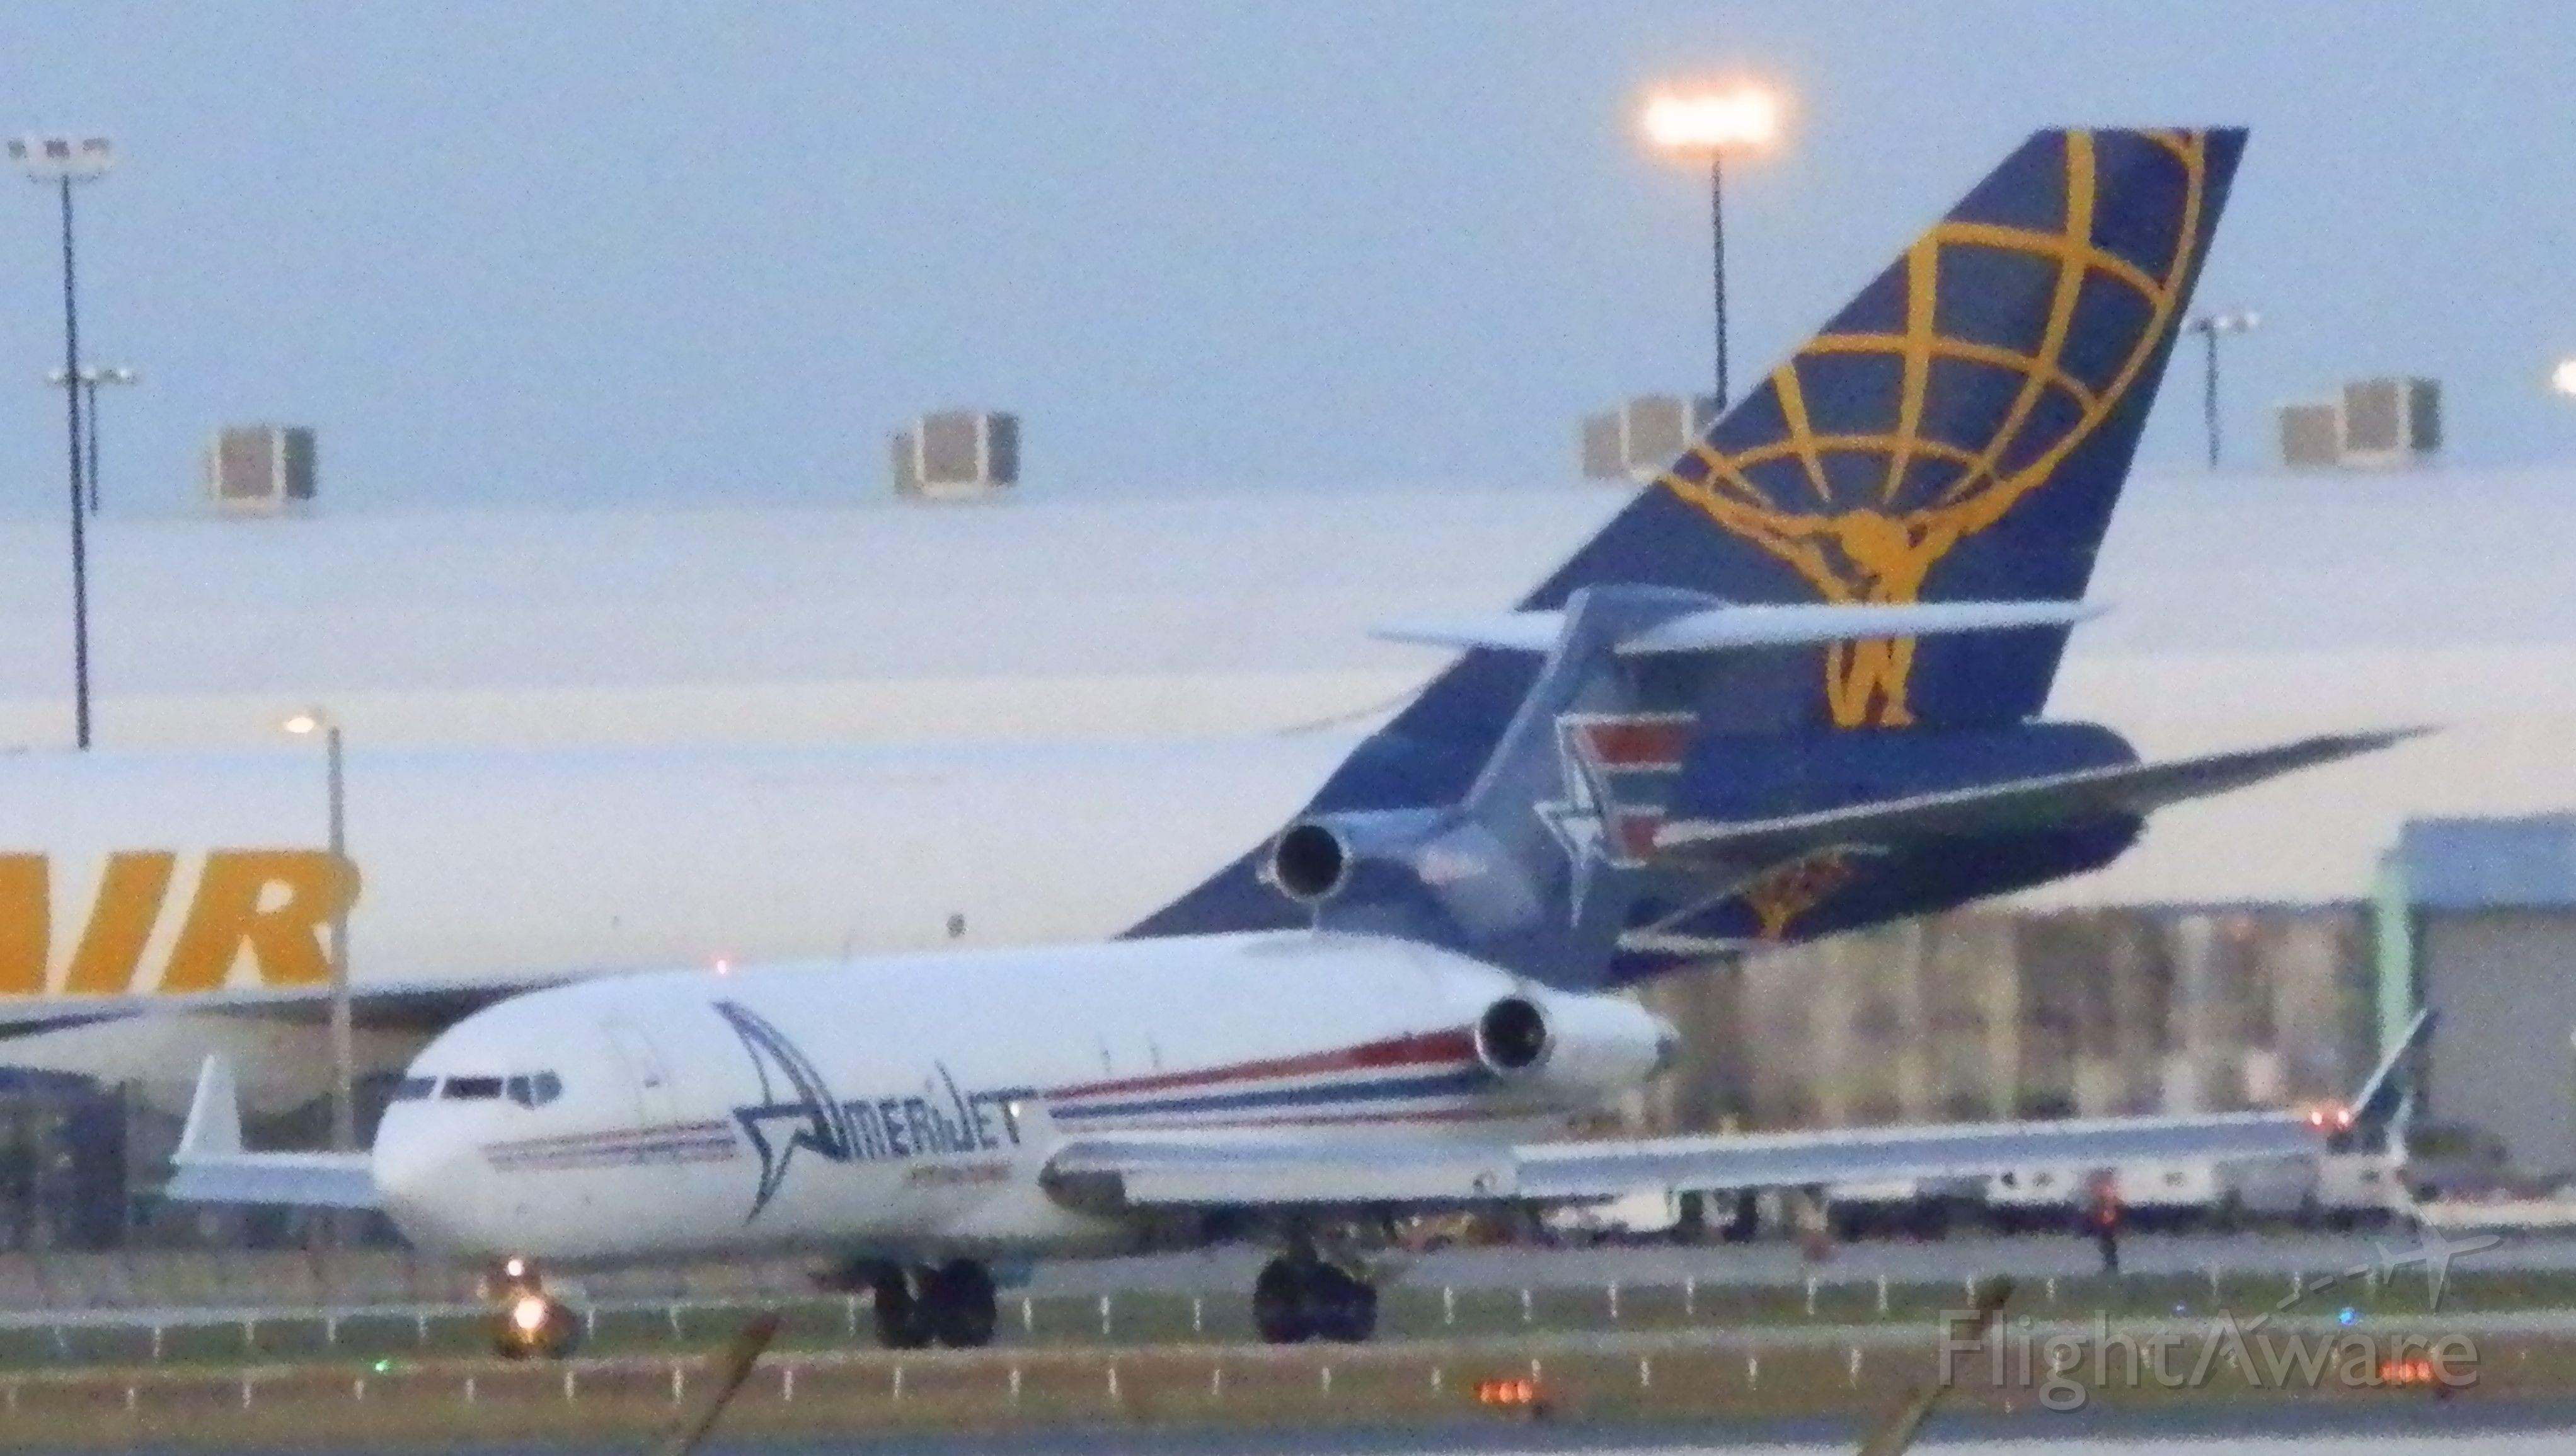 BOEING 727-200 (N395AJ) - What a size comparison!!!